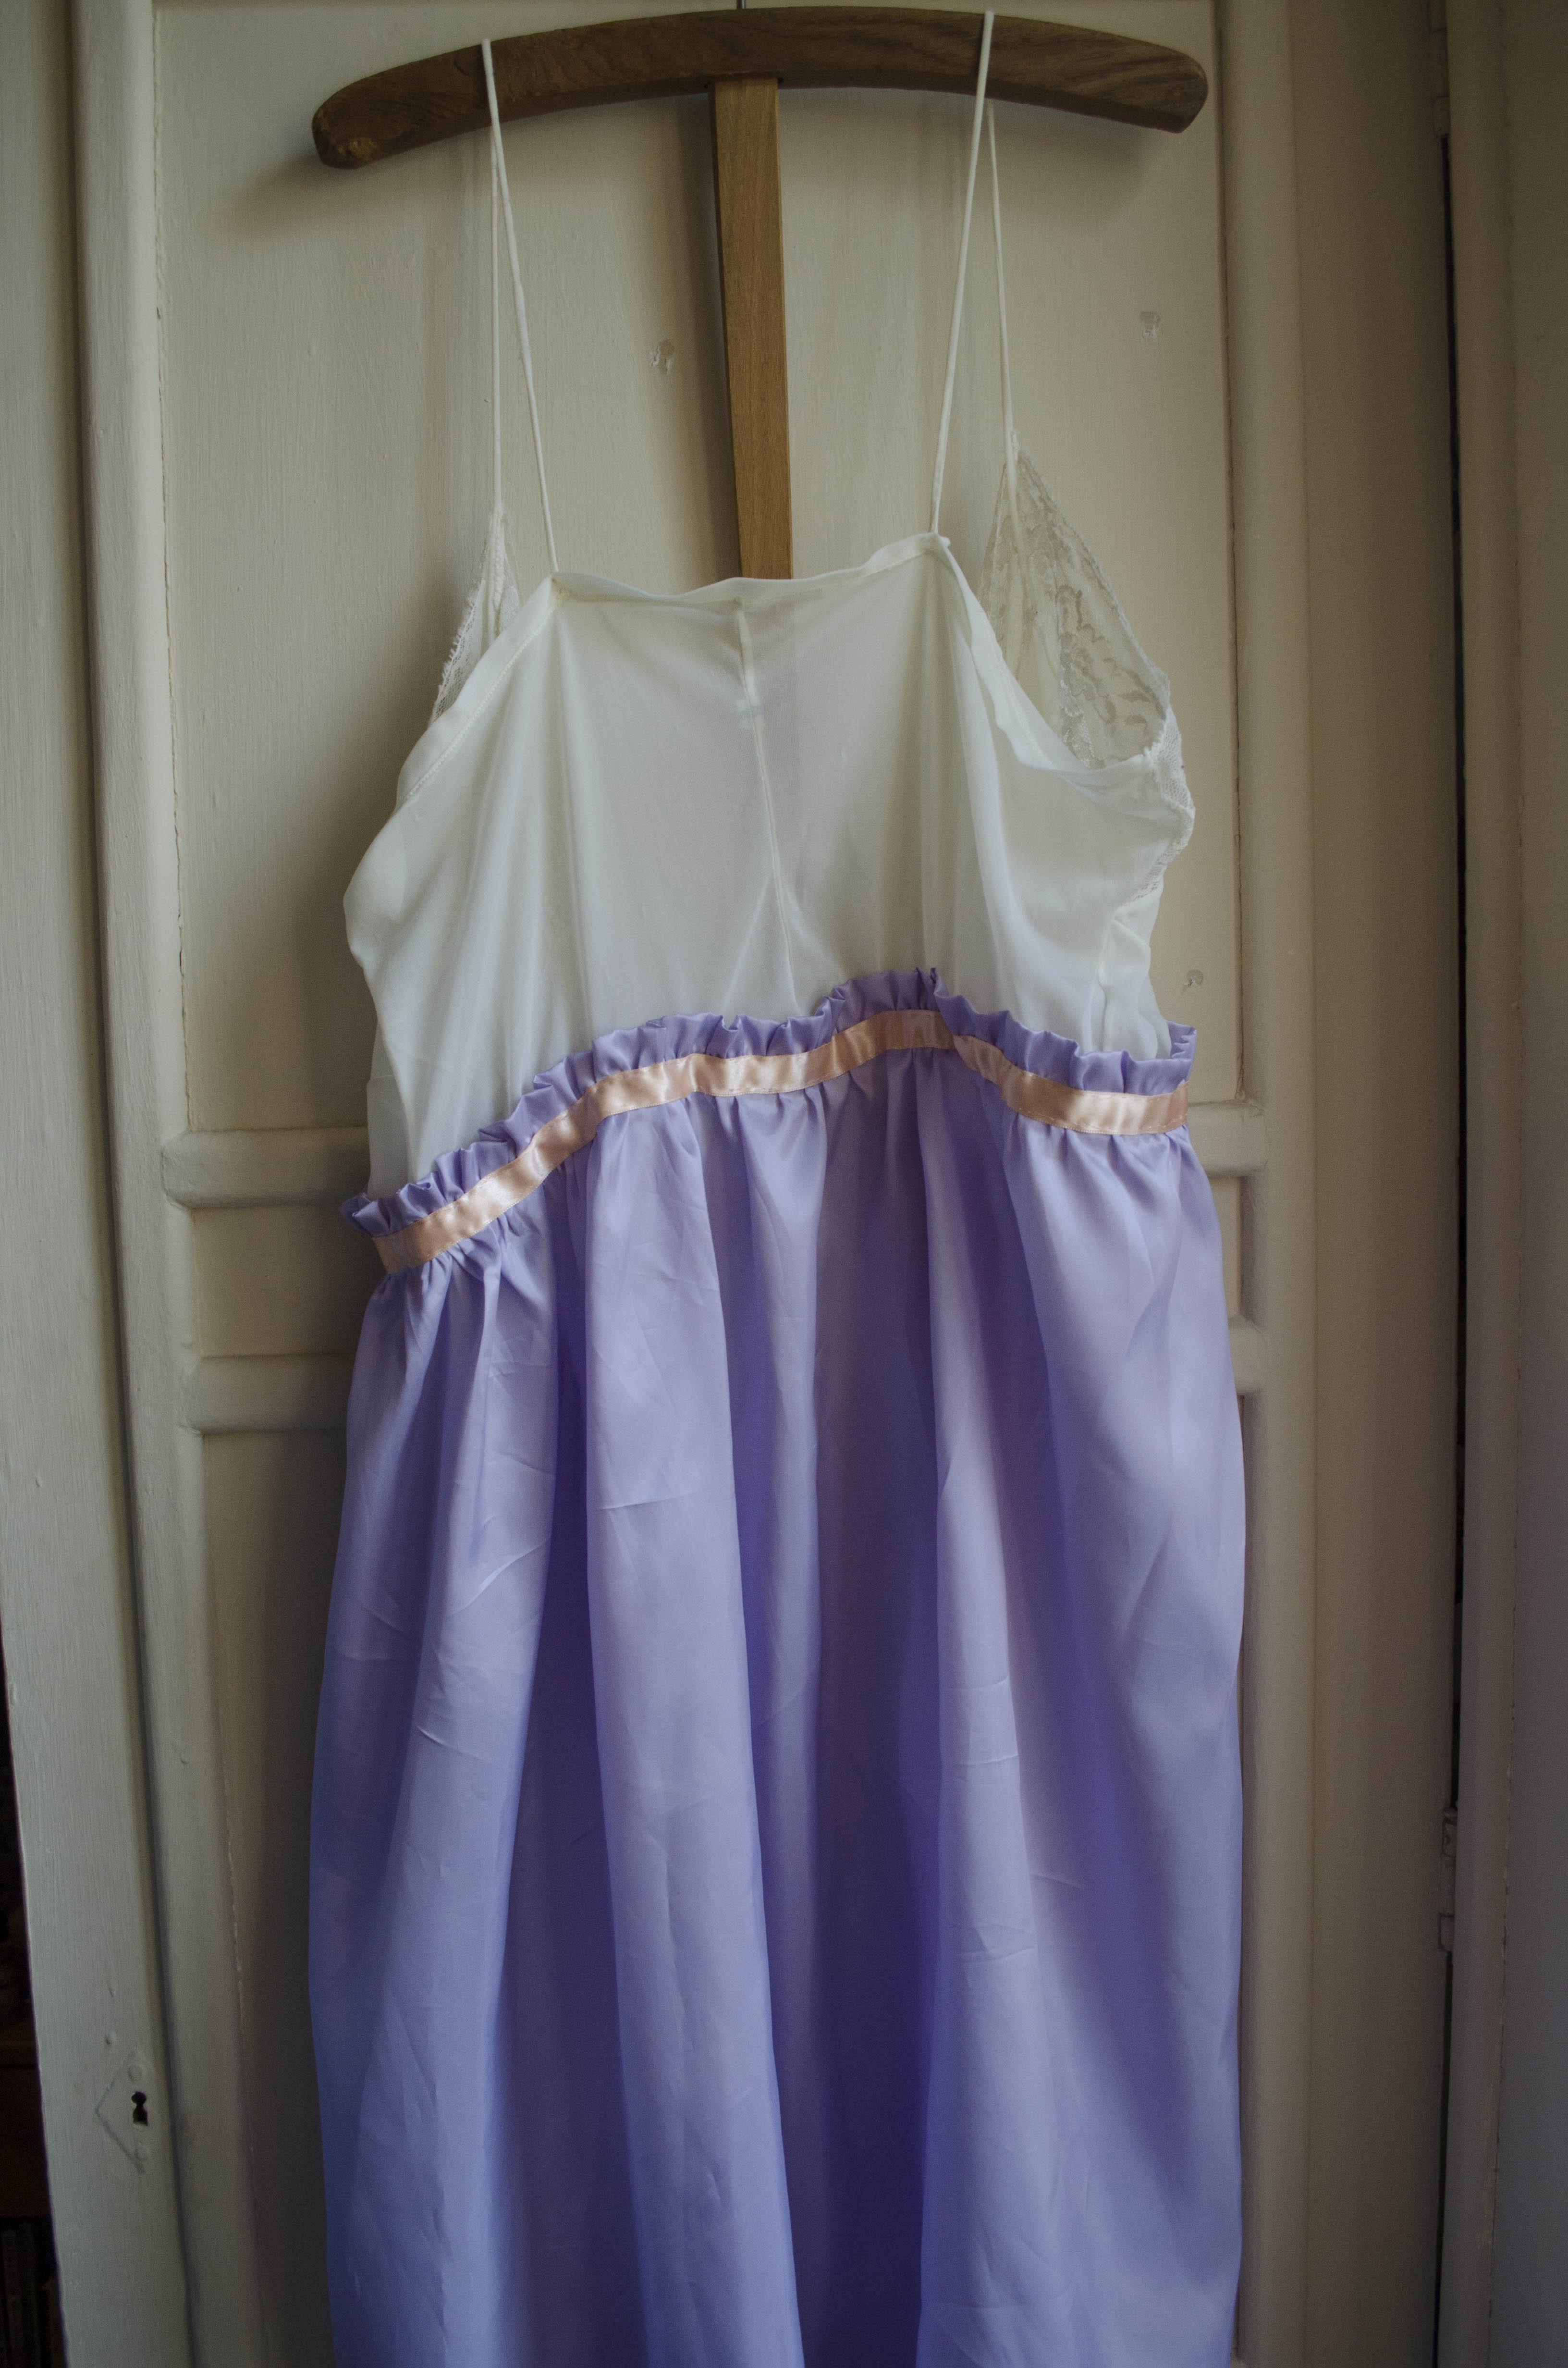 de06fac06f ballerina dressing gown · Nostalgiche Creature · Online Store ...